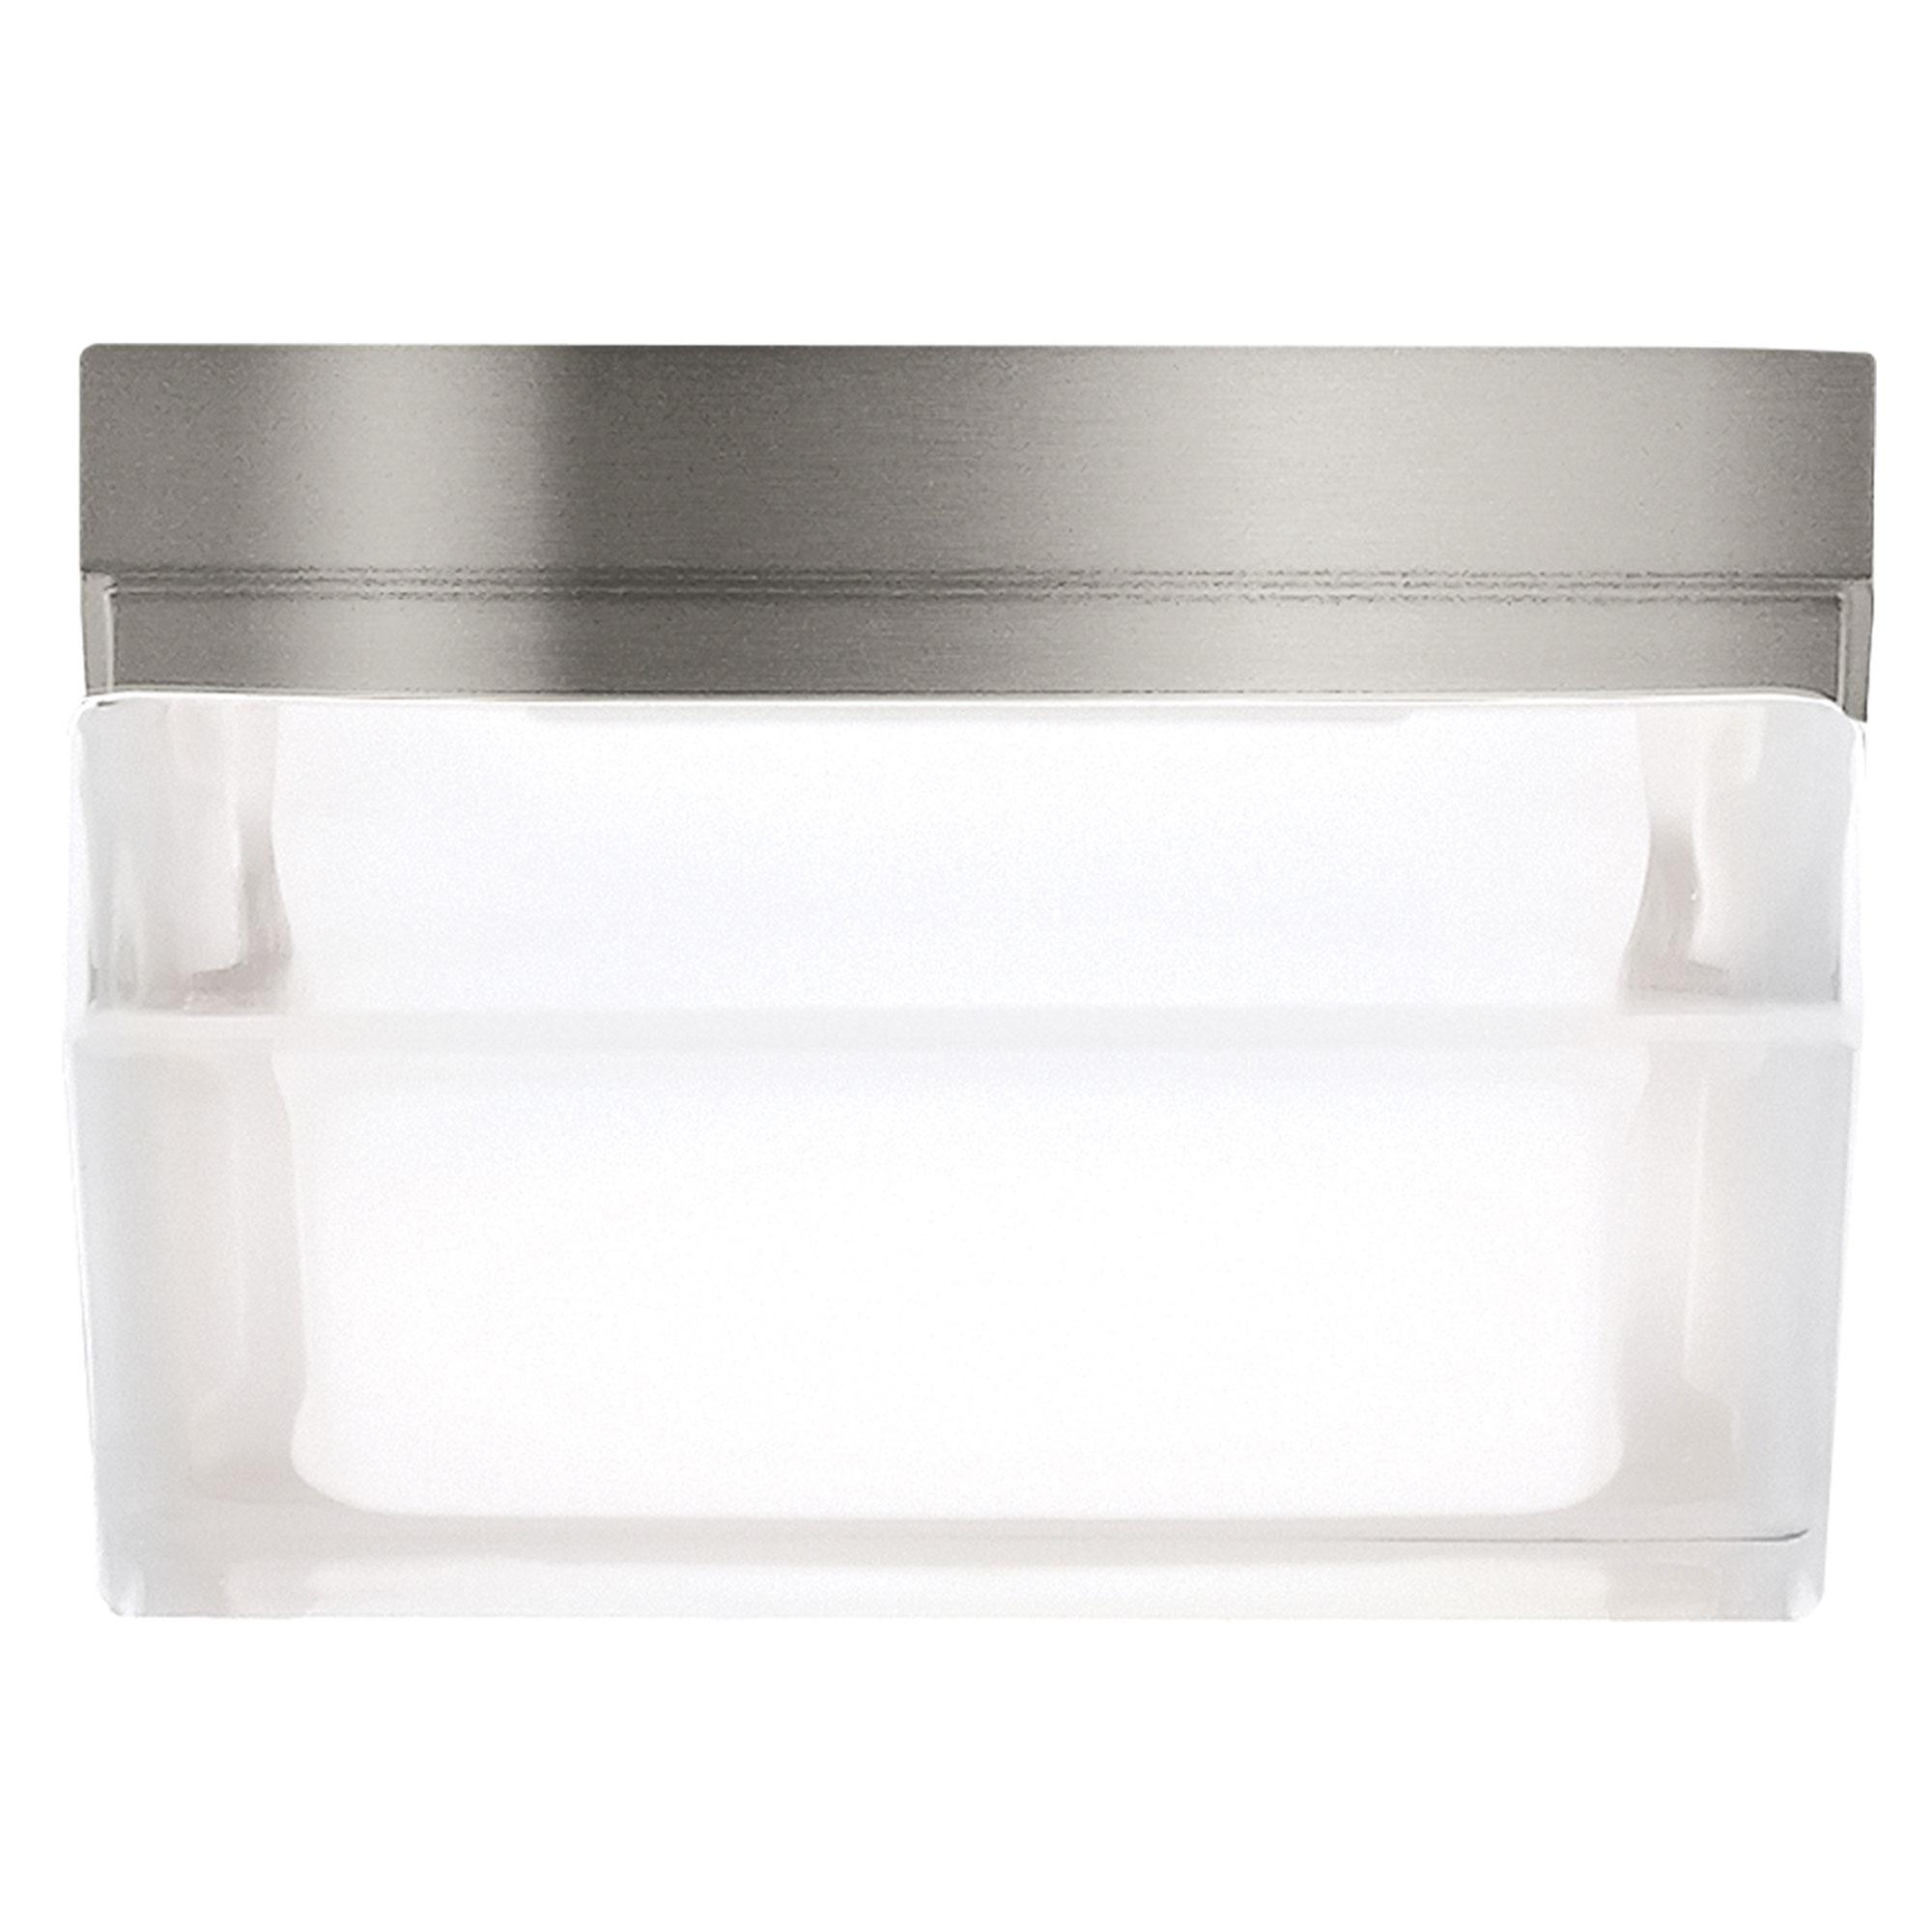 Boxie Halogen Ceiling Light Fixture By Tech Lighting 700bxss